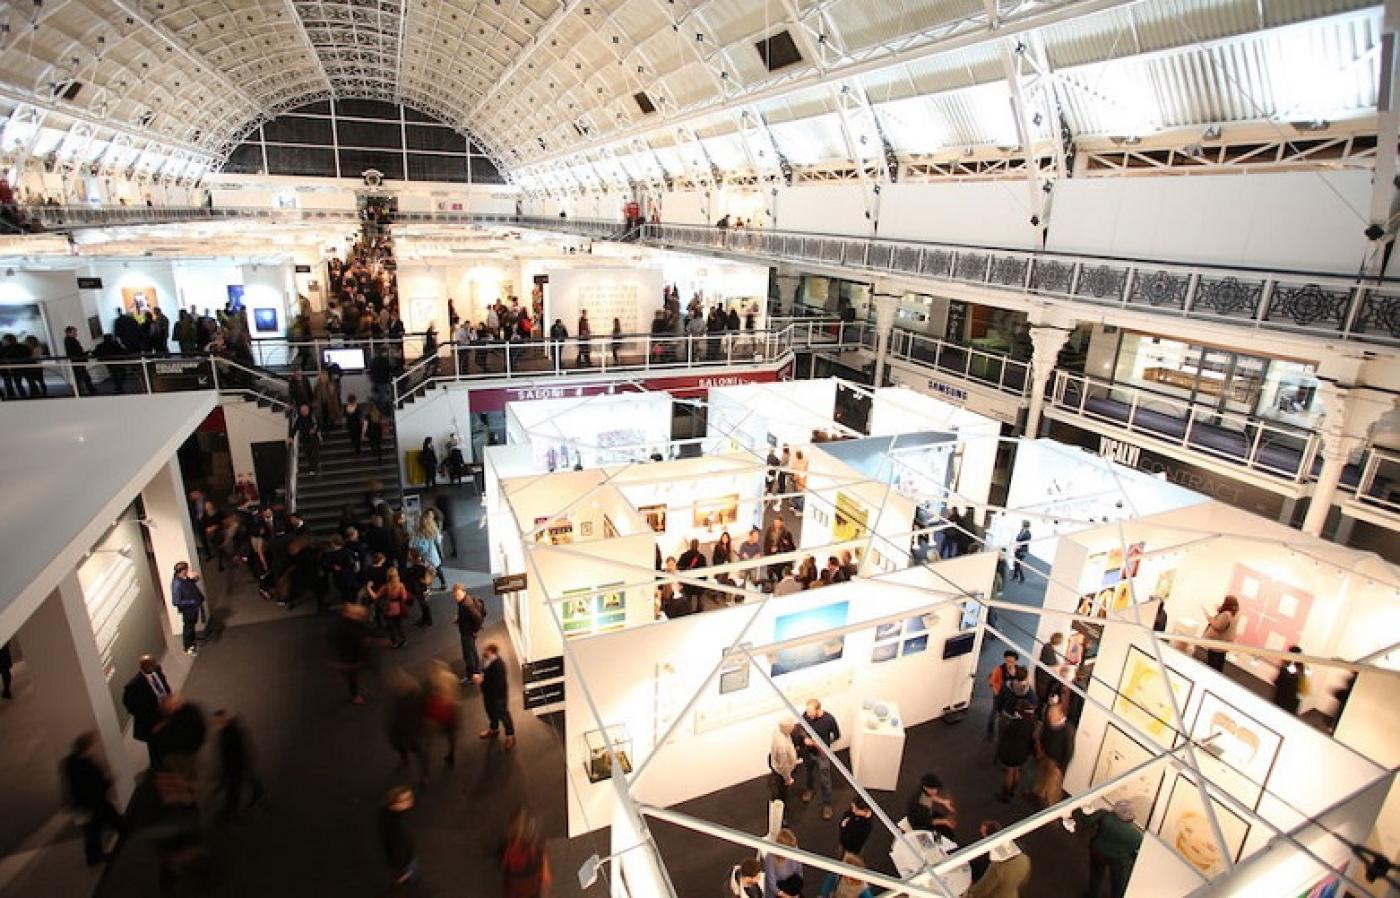 This Week's Major Events: Winter Antiques Show, MAISON&OBJET Paris, Outsider Art Fair, New York Ceramics & Glass Fair & More